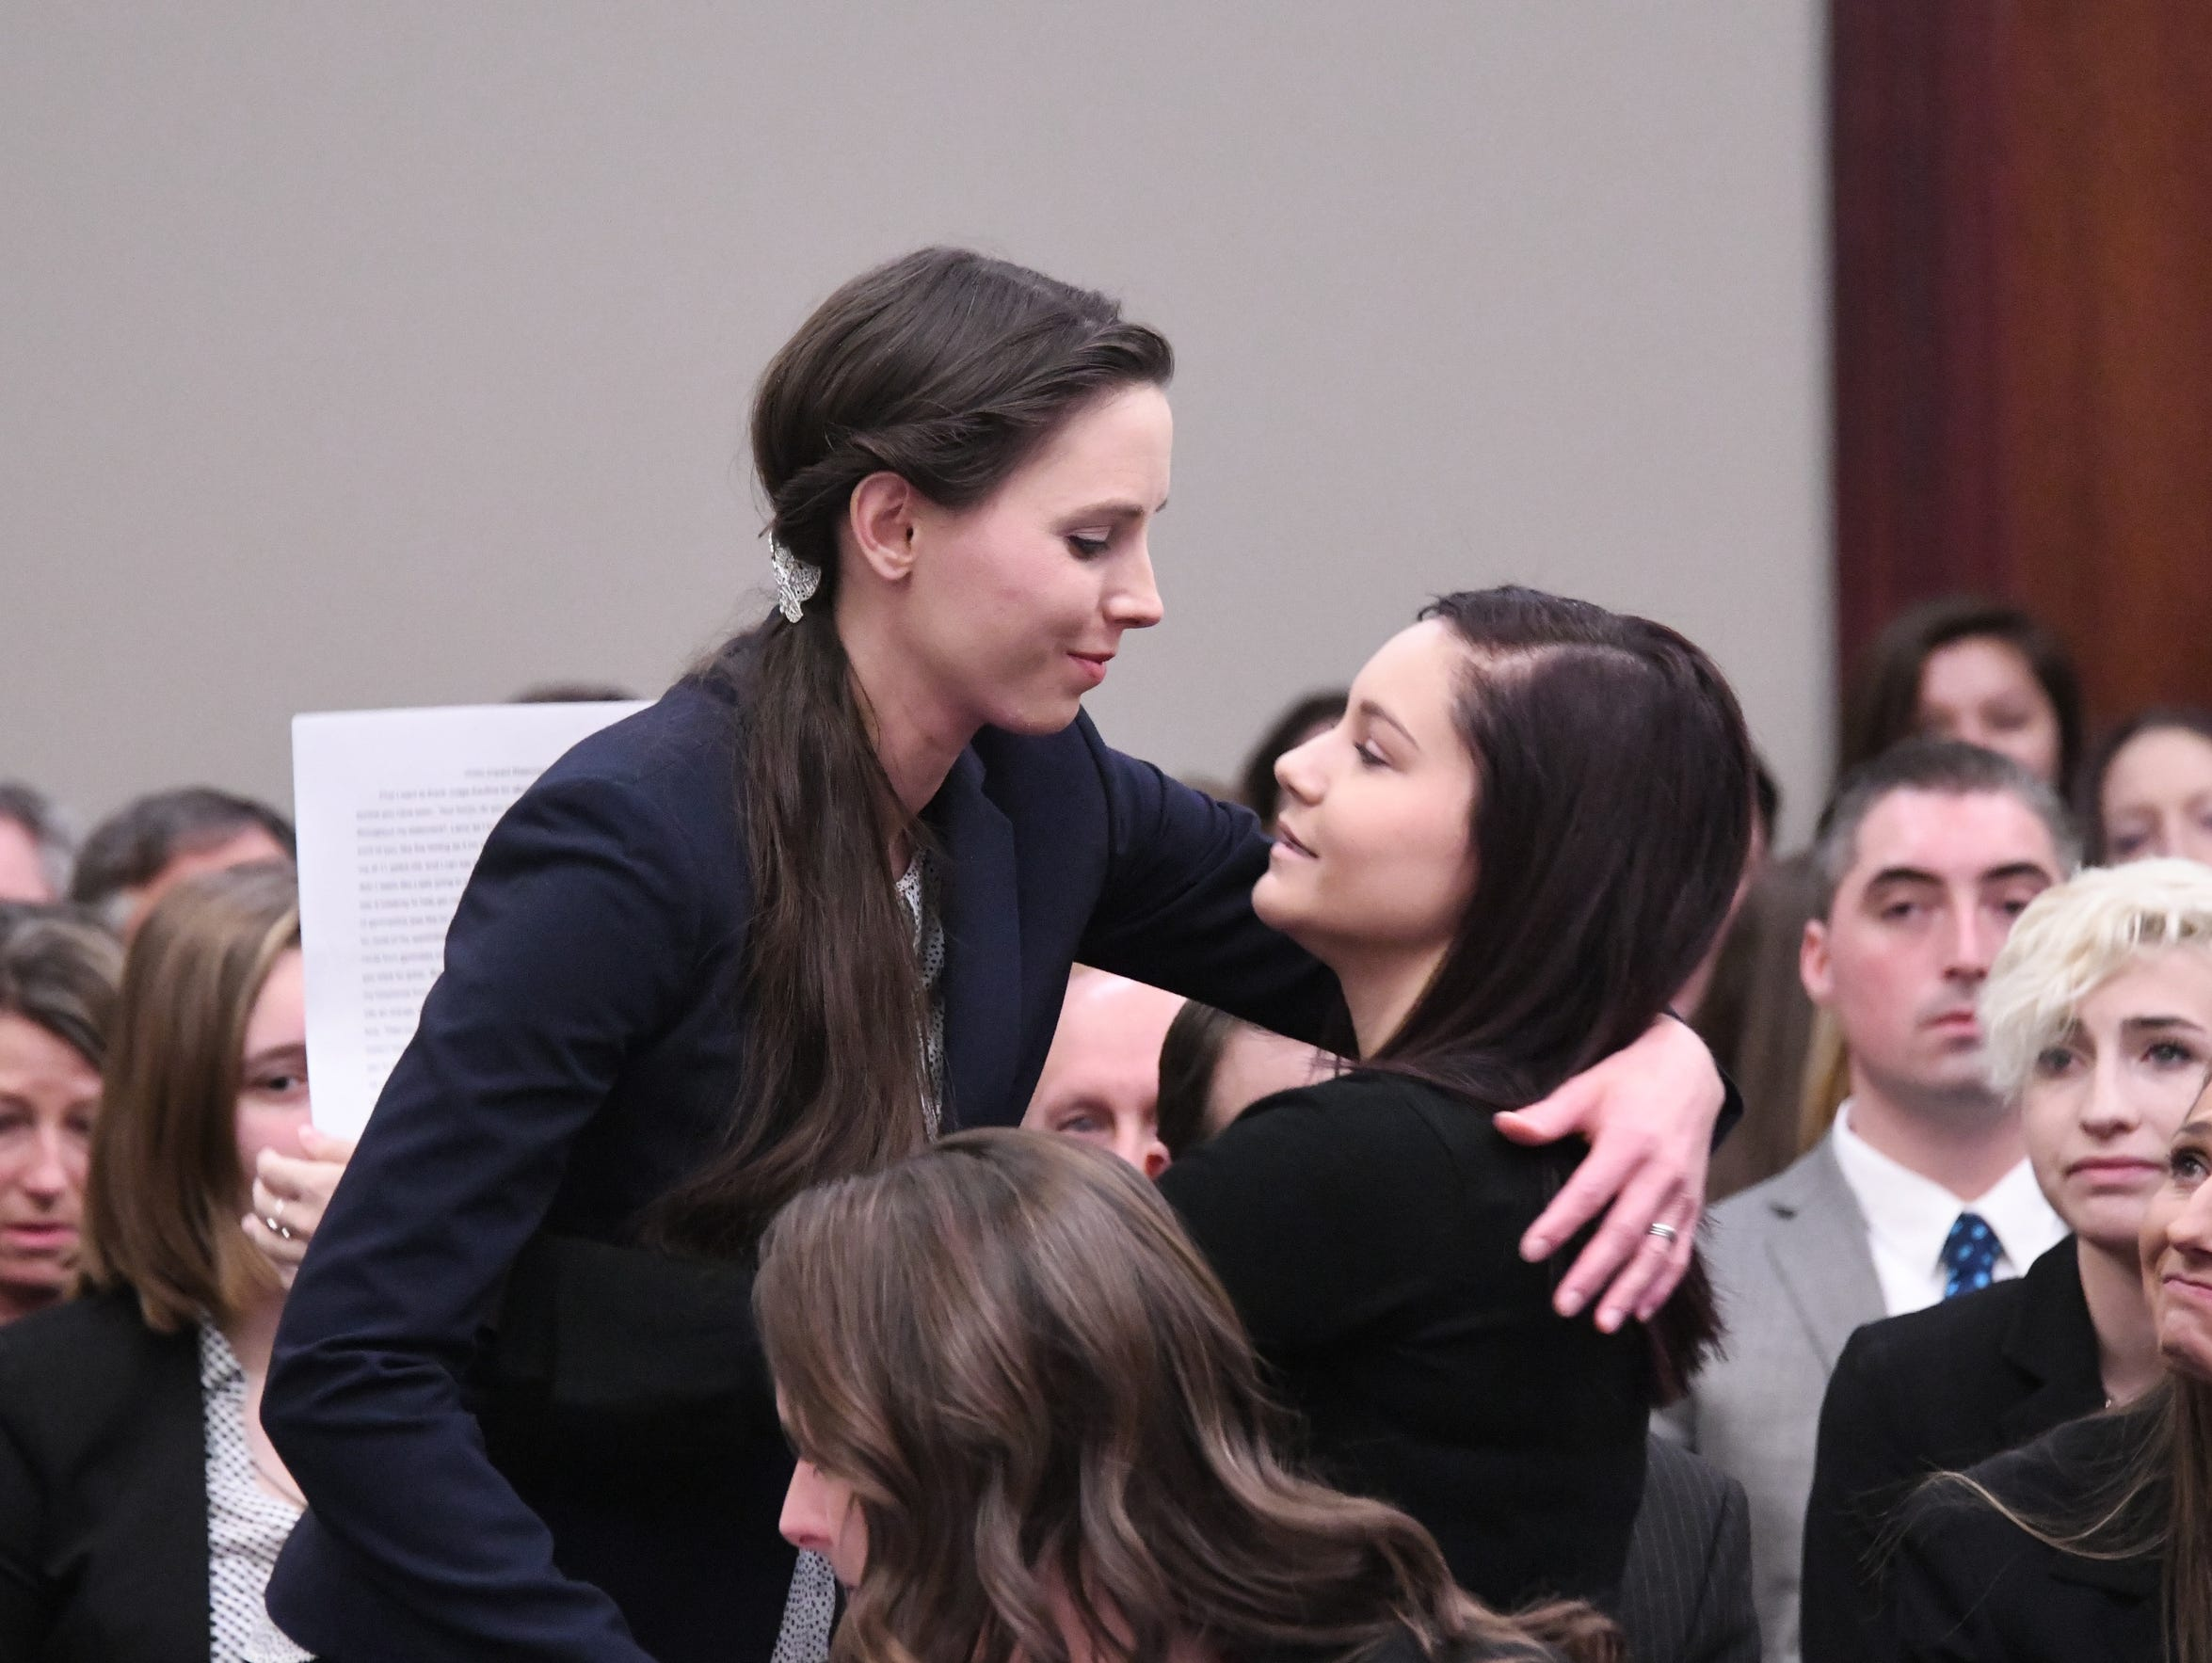 Rachael DenHollander hugs fellow Nassar victim Kaylee